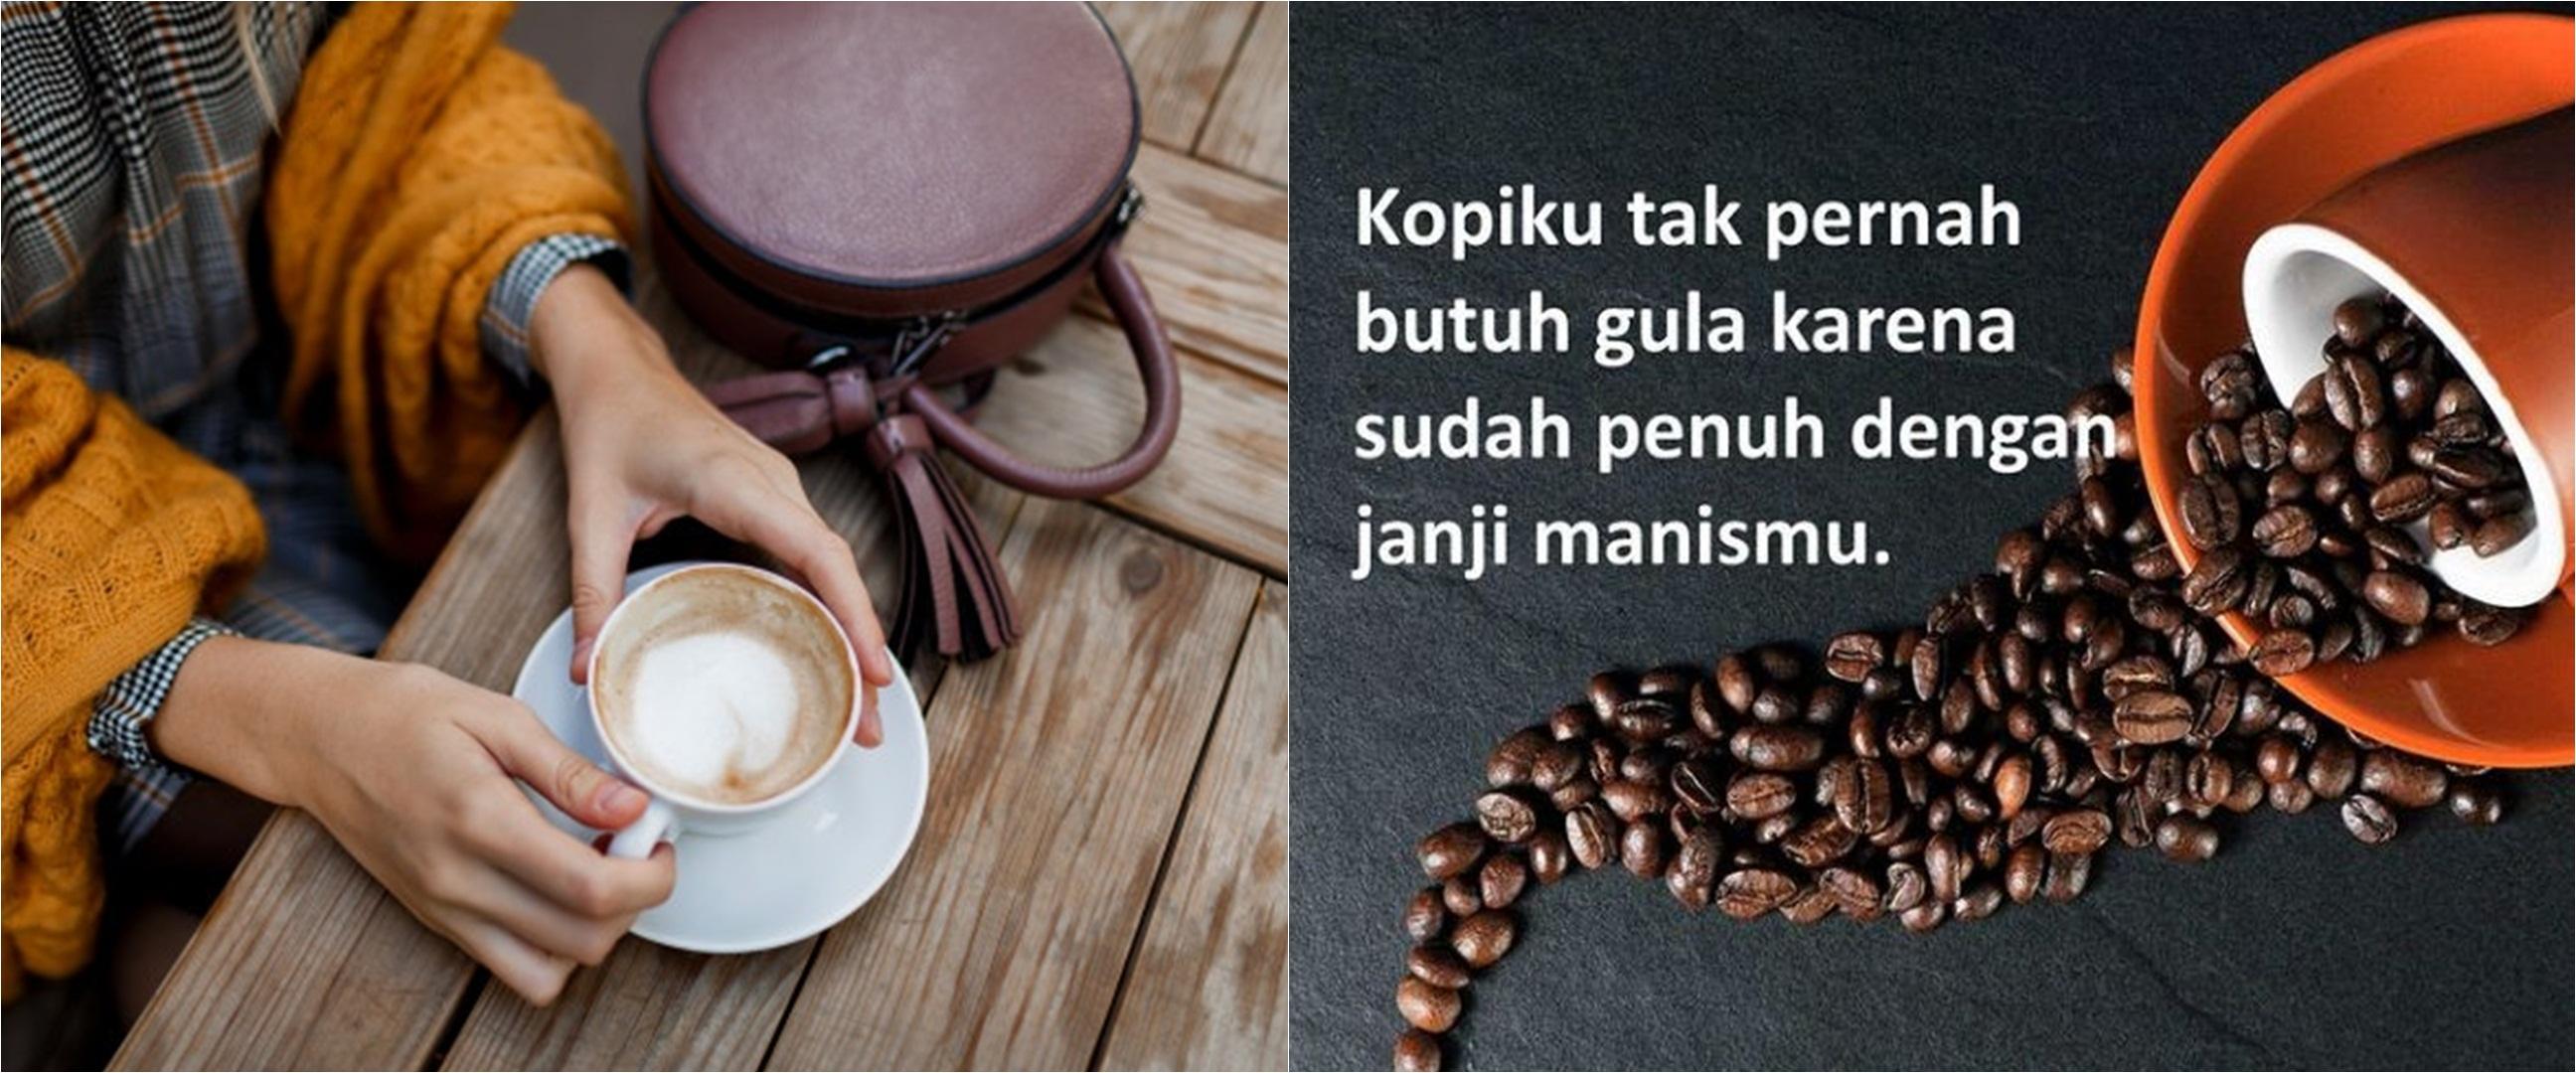 101 Kata-kata quotes tentang kopi, lucu, inspiratif dan penuh makna